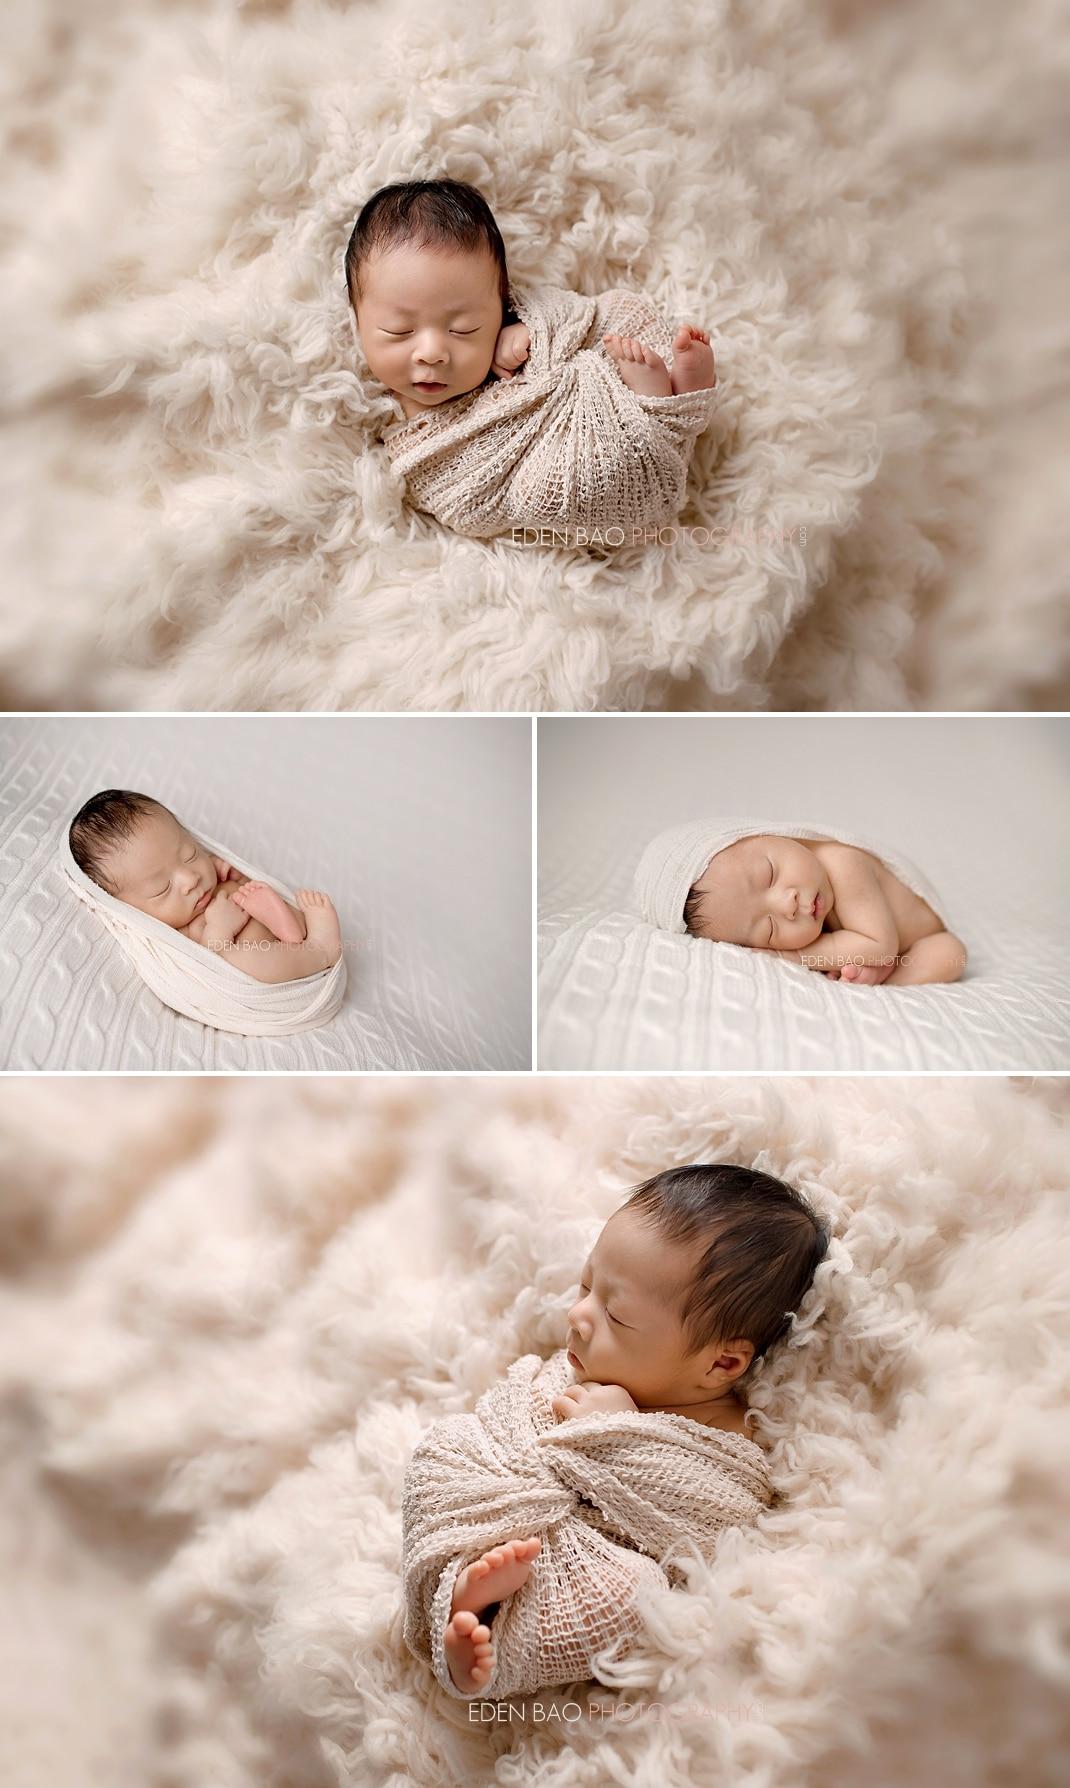 Vancouver BC Newborn Photographer Eden Bao Bennett cream backdrop